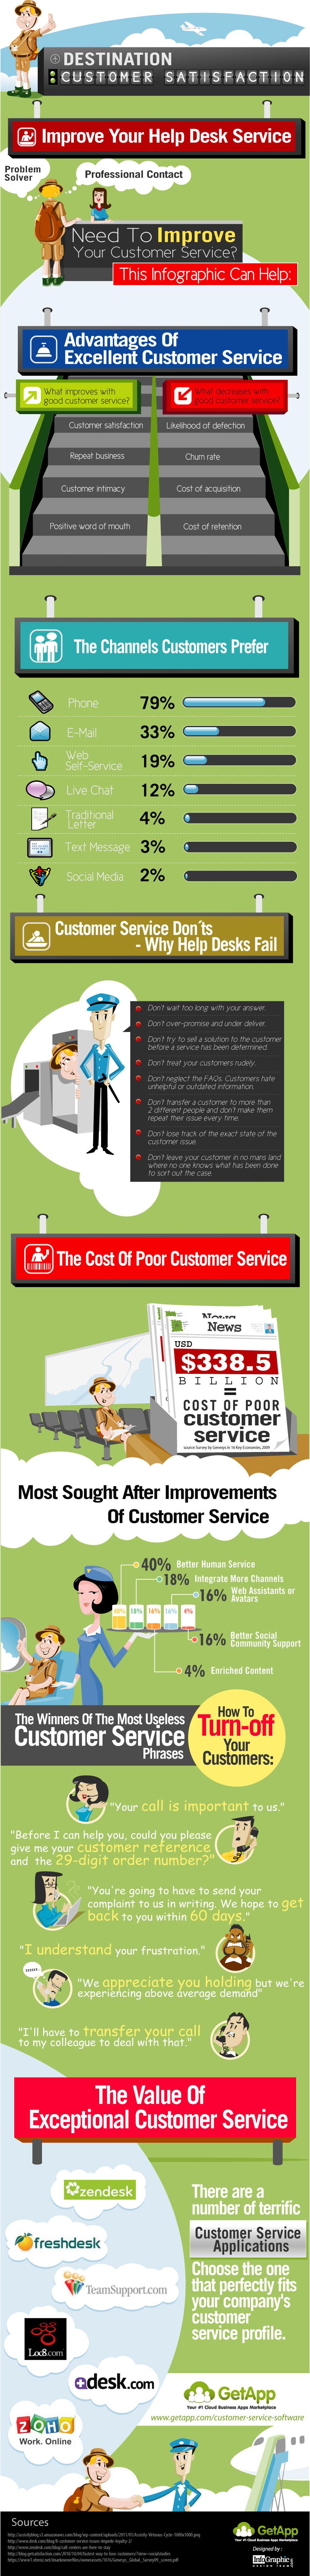 Customer-Satisfaction-infographic